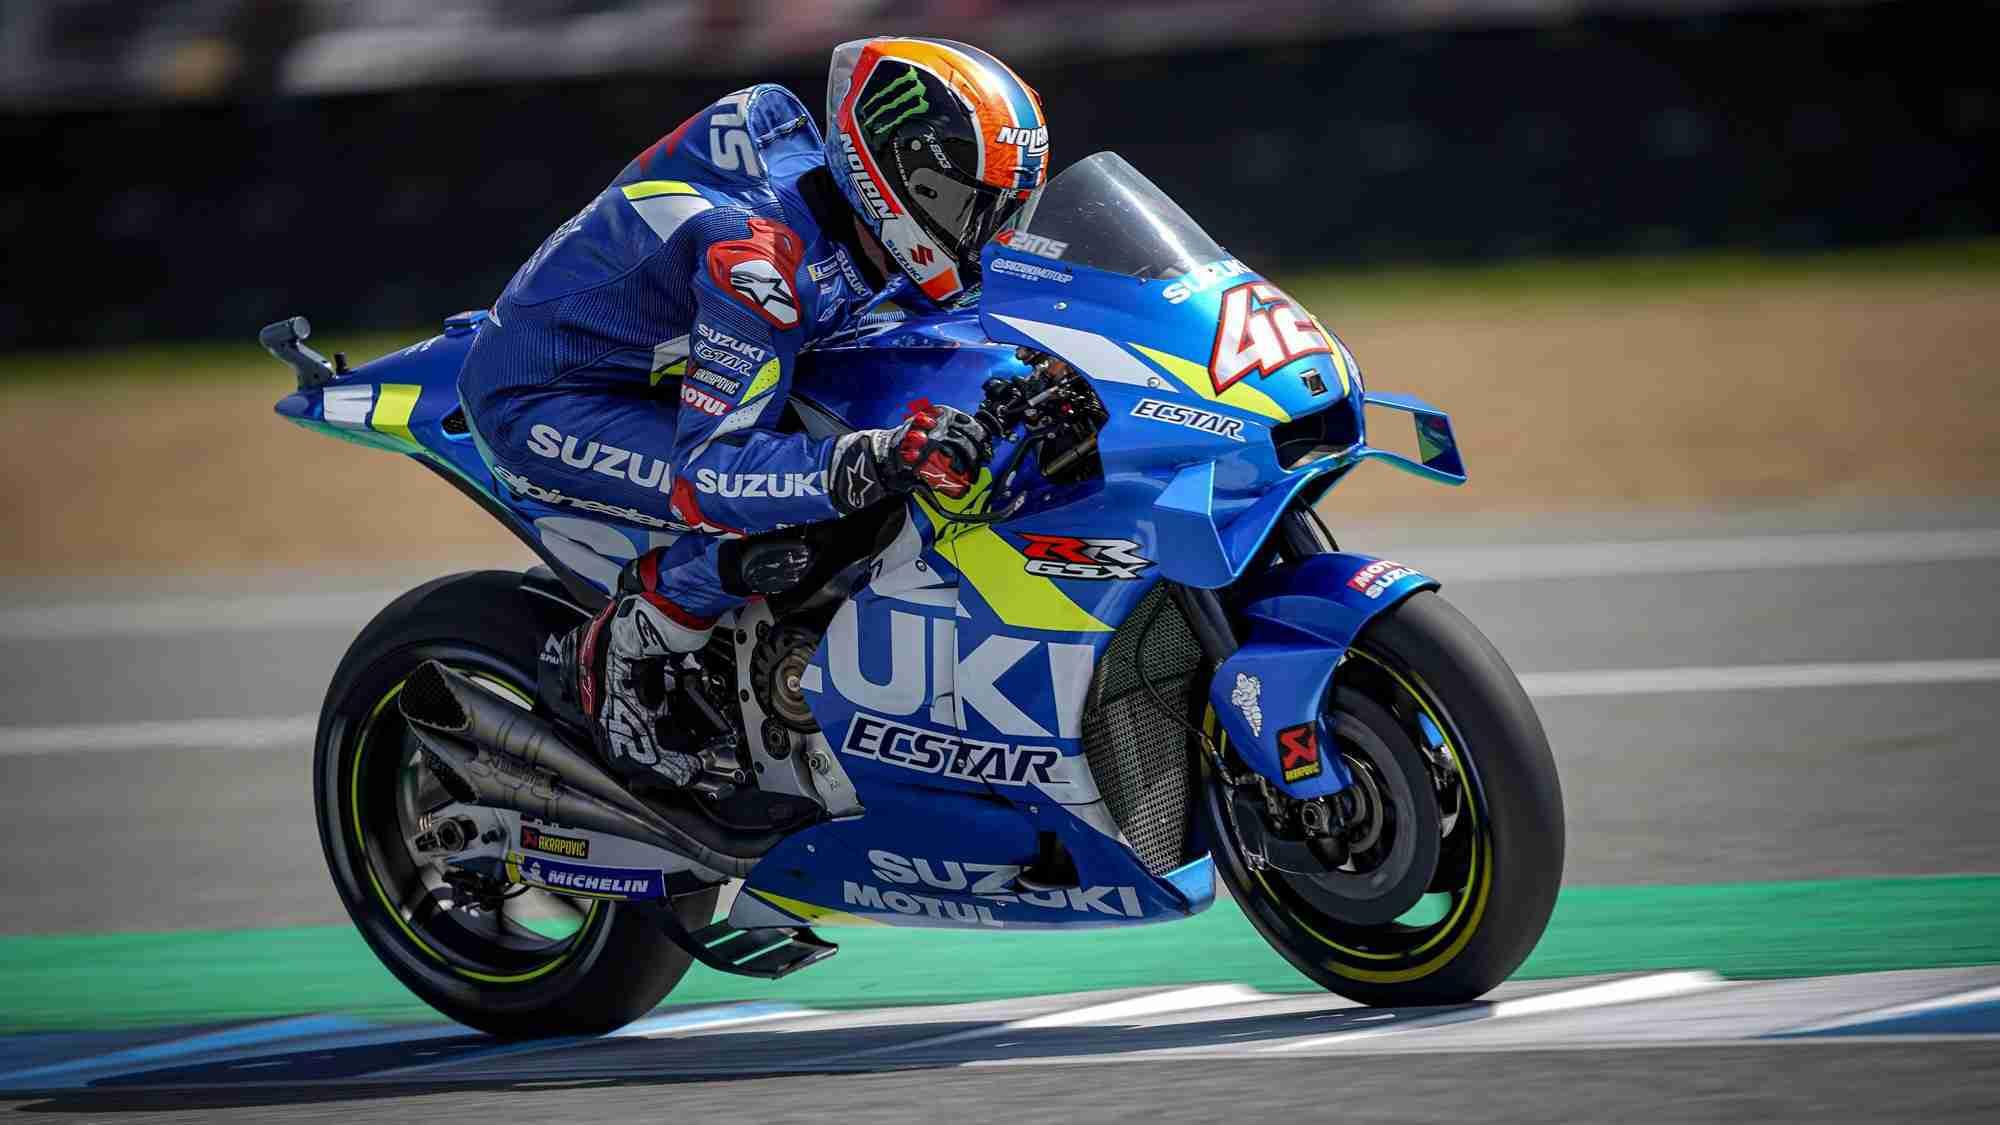 Alex Rins - MotoGP HD wallpaper Buriram